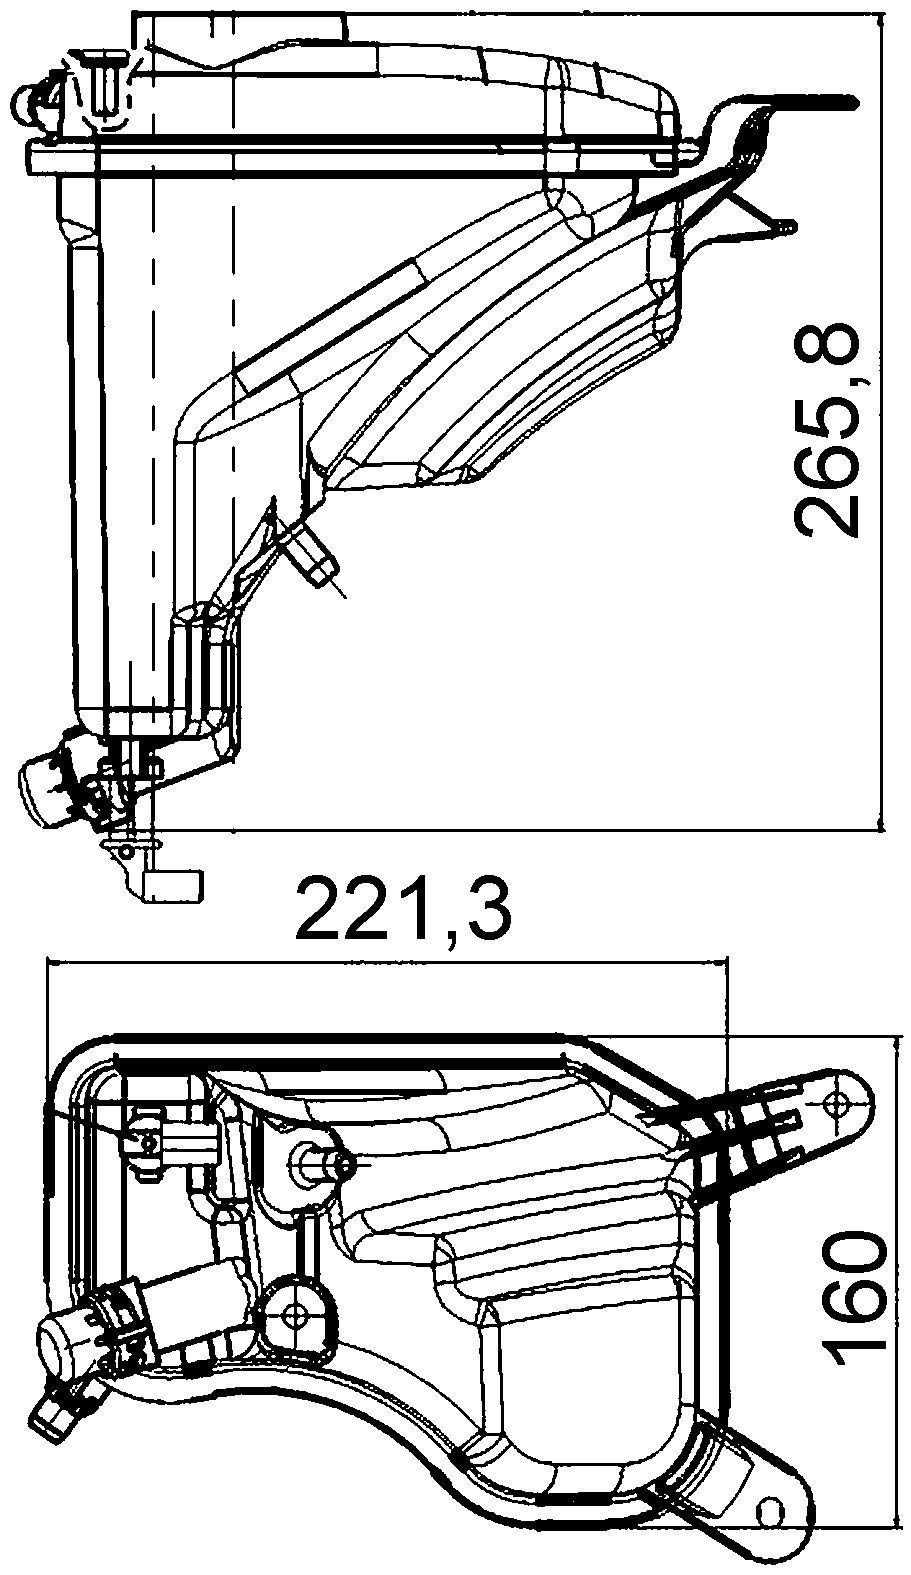 2008 BMW 135i Engine Coolant Reservoir (Hella 376789751) 221x266x160 .